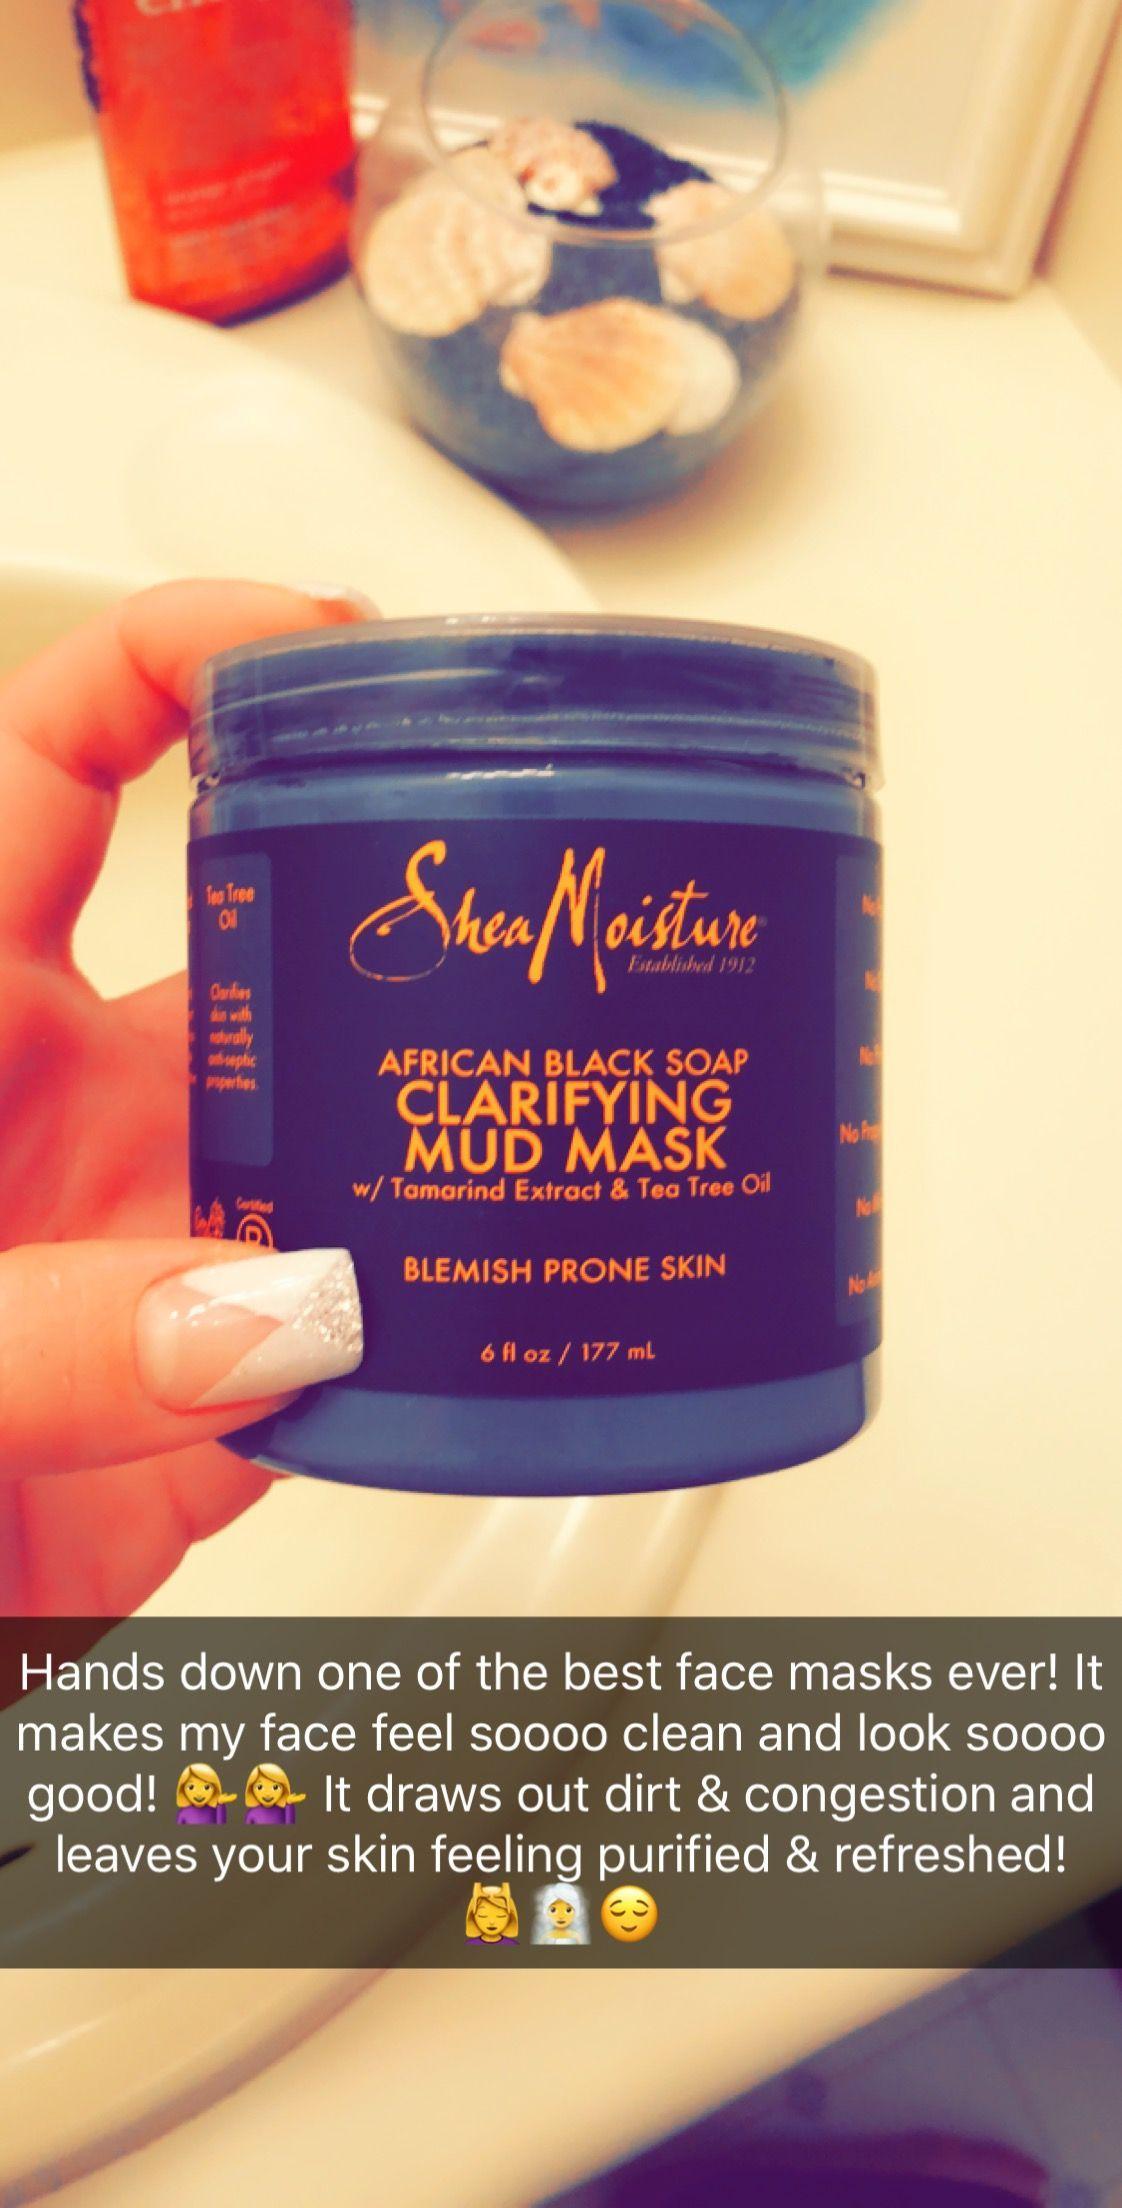 Shea Moisture African Black Soap Clarifying Mid Mask W Tamarind Extract Tea Tee Oil A Shea Moisture Products Shea Moisture Face Mask Oily Skin Care Routine